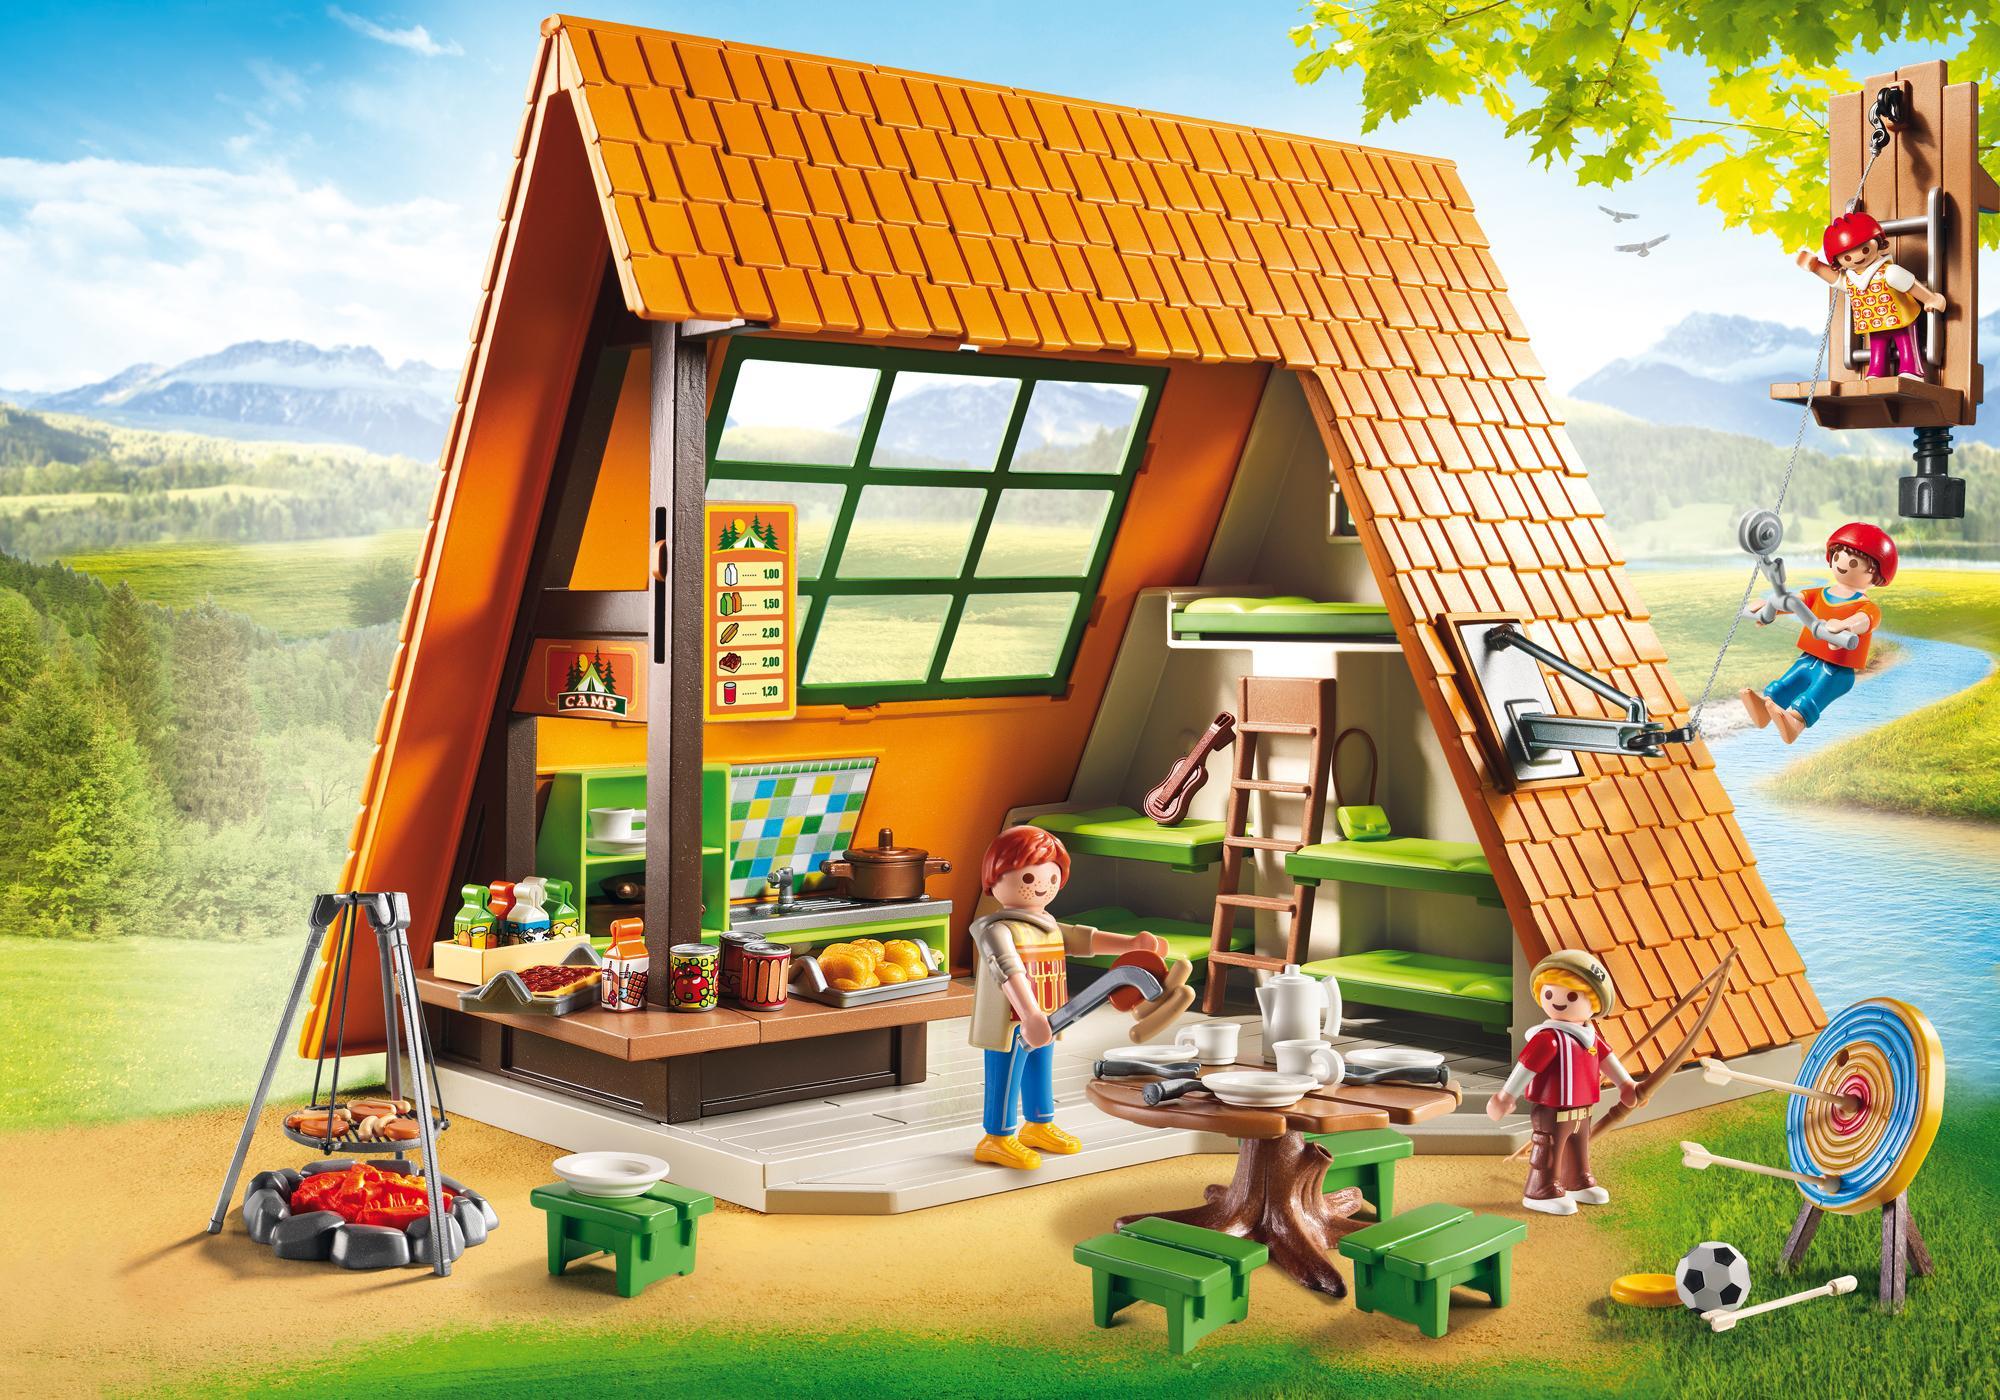 http://media.playmobil.com/i/playmobil/6887_product_detail